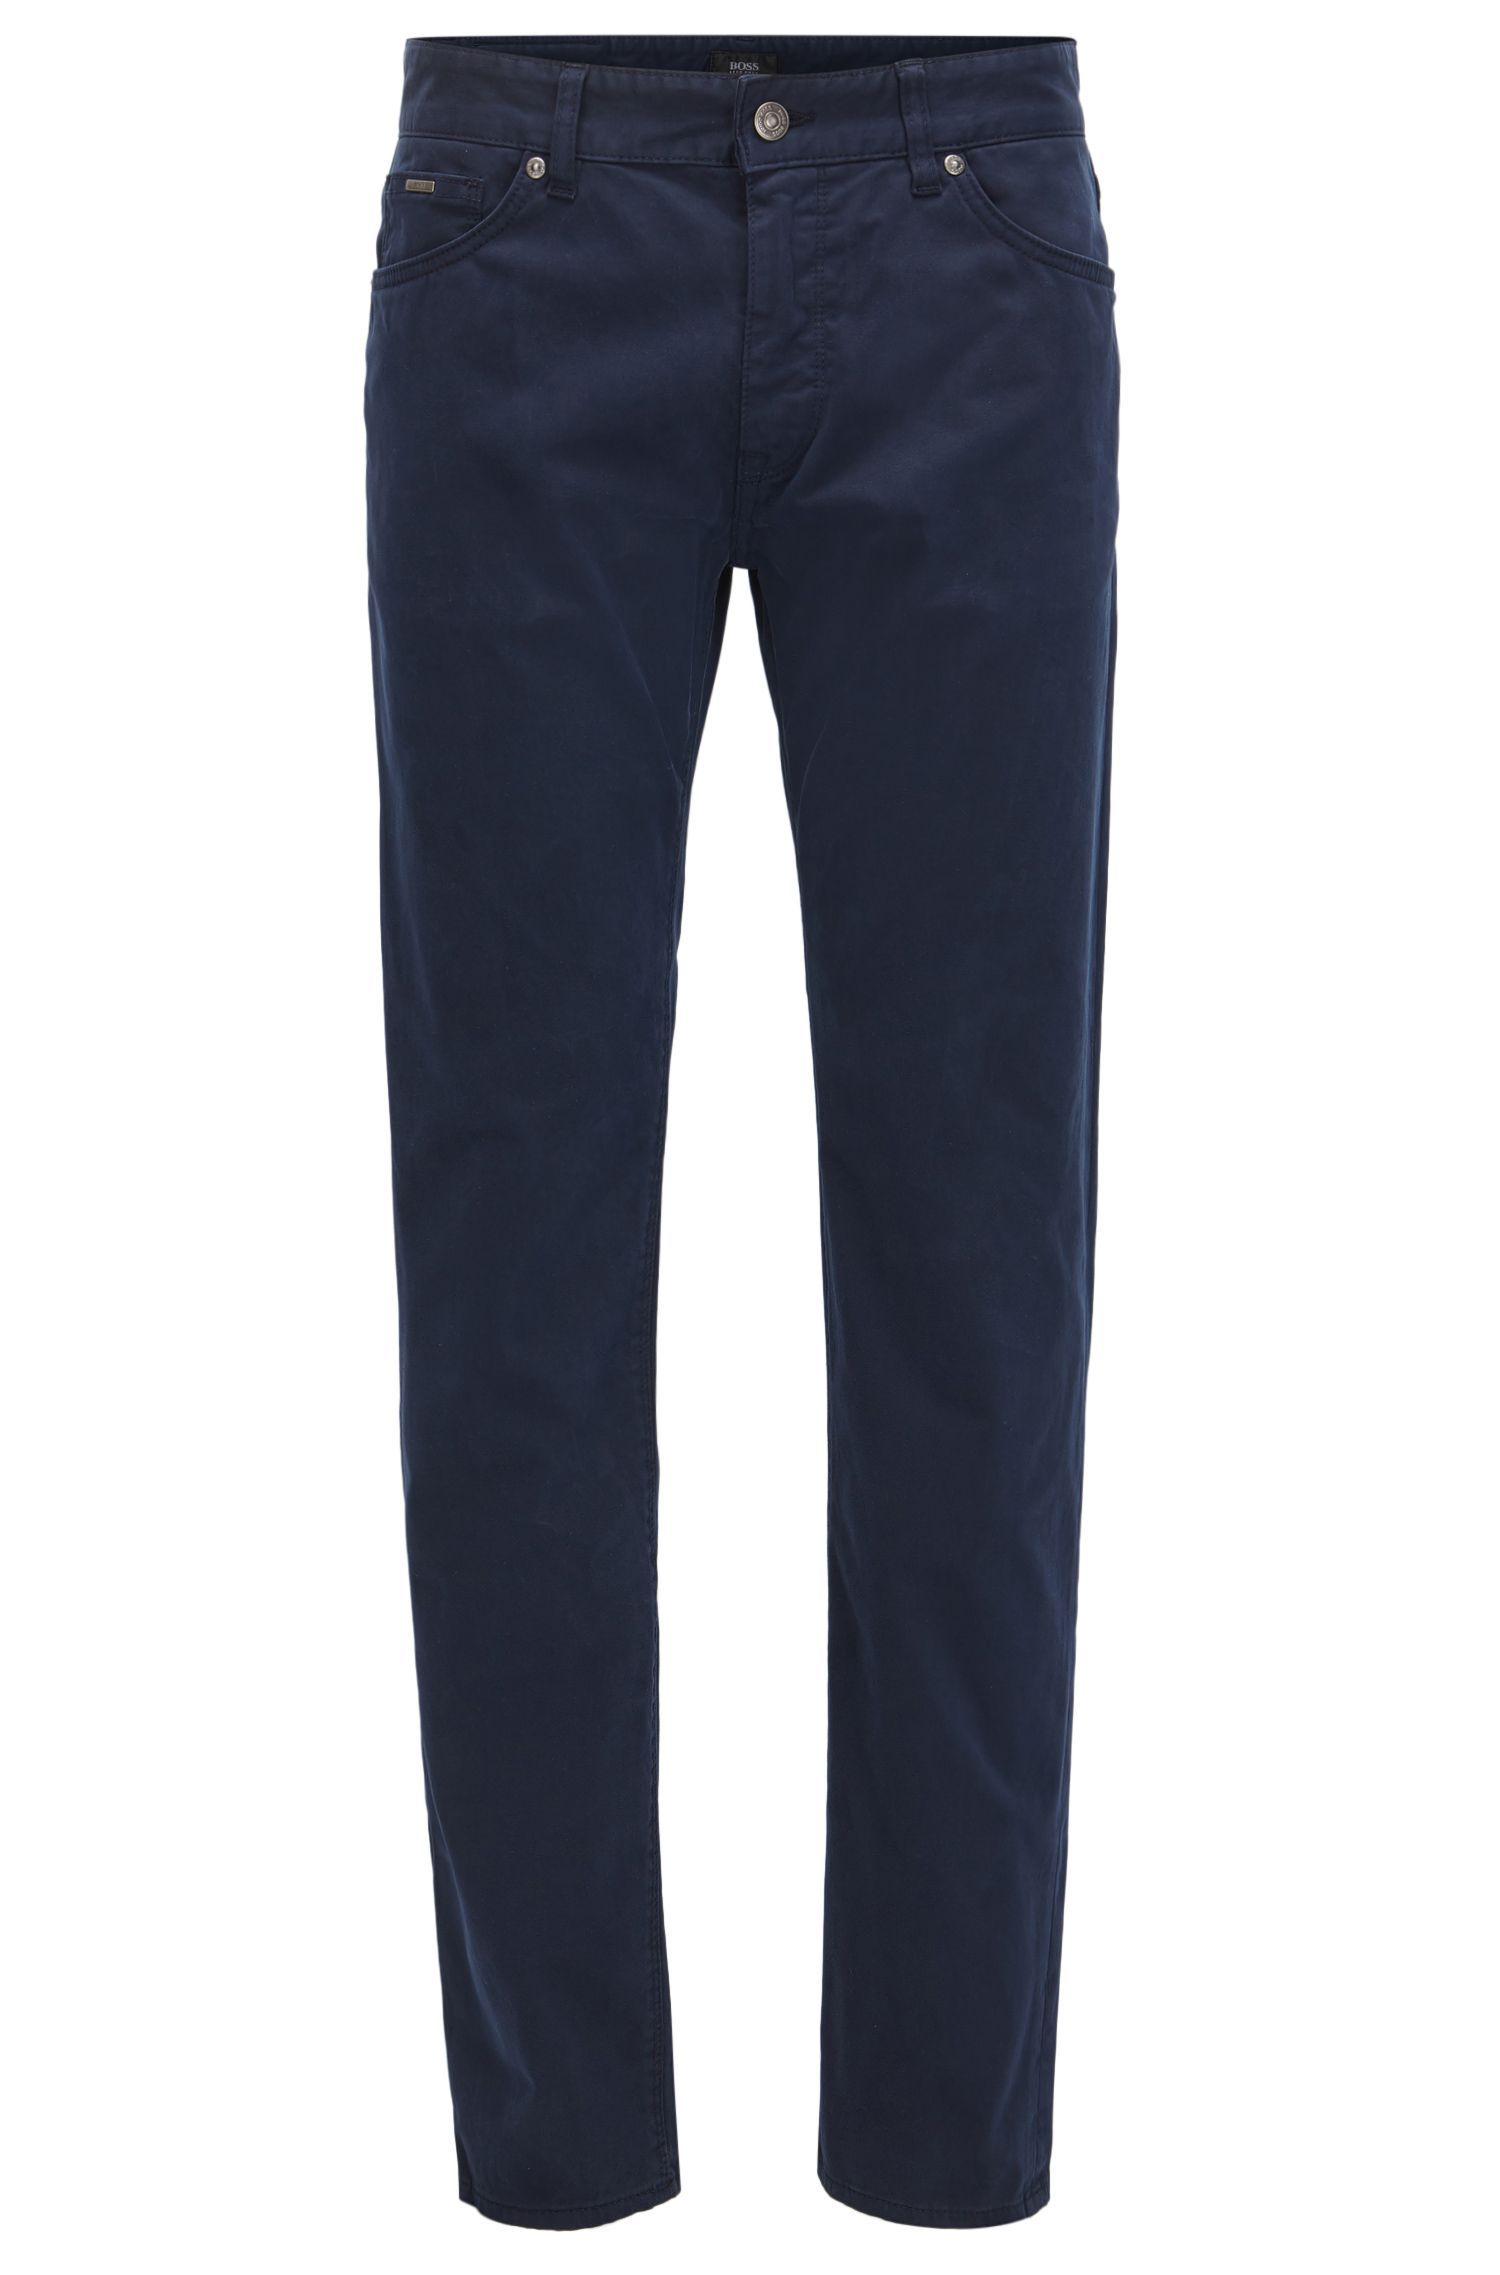 Jeans Regular Fit en satin stretch brossé, finition Diamond Brushed